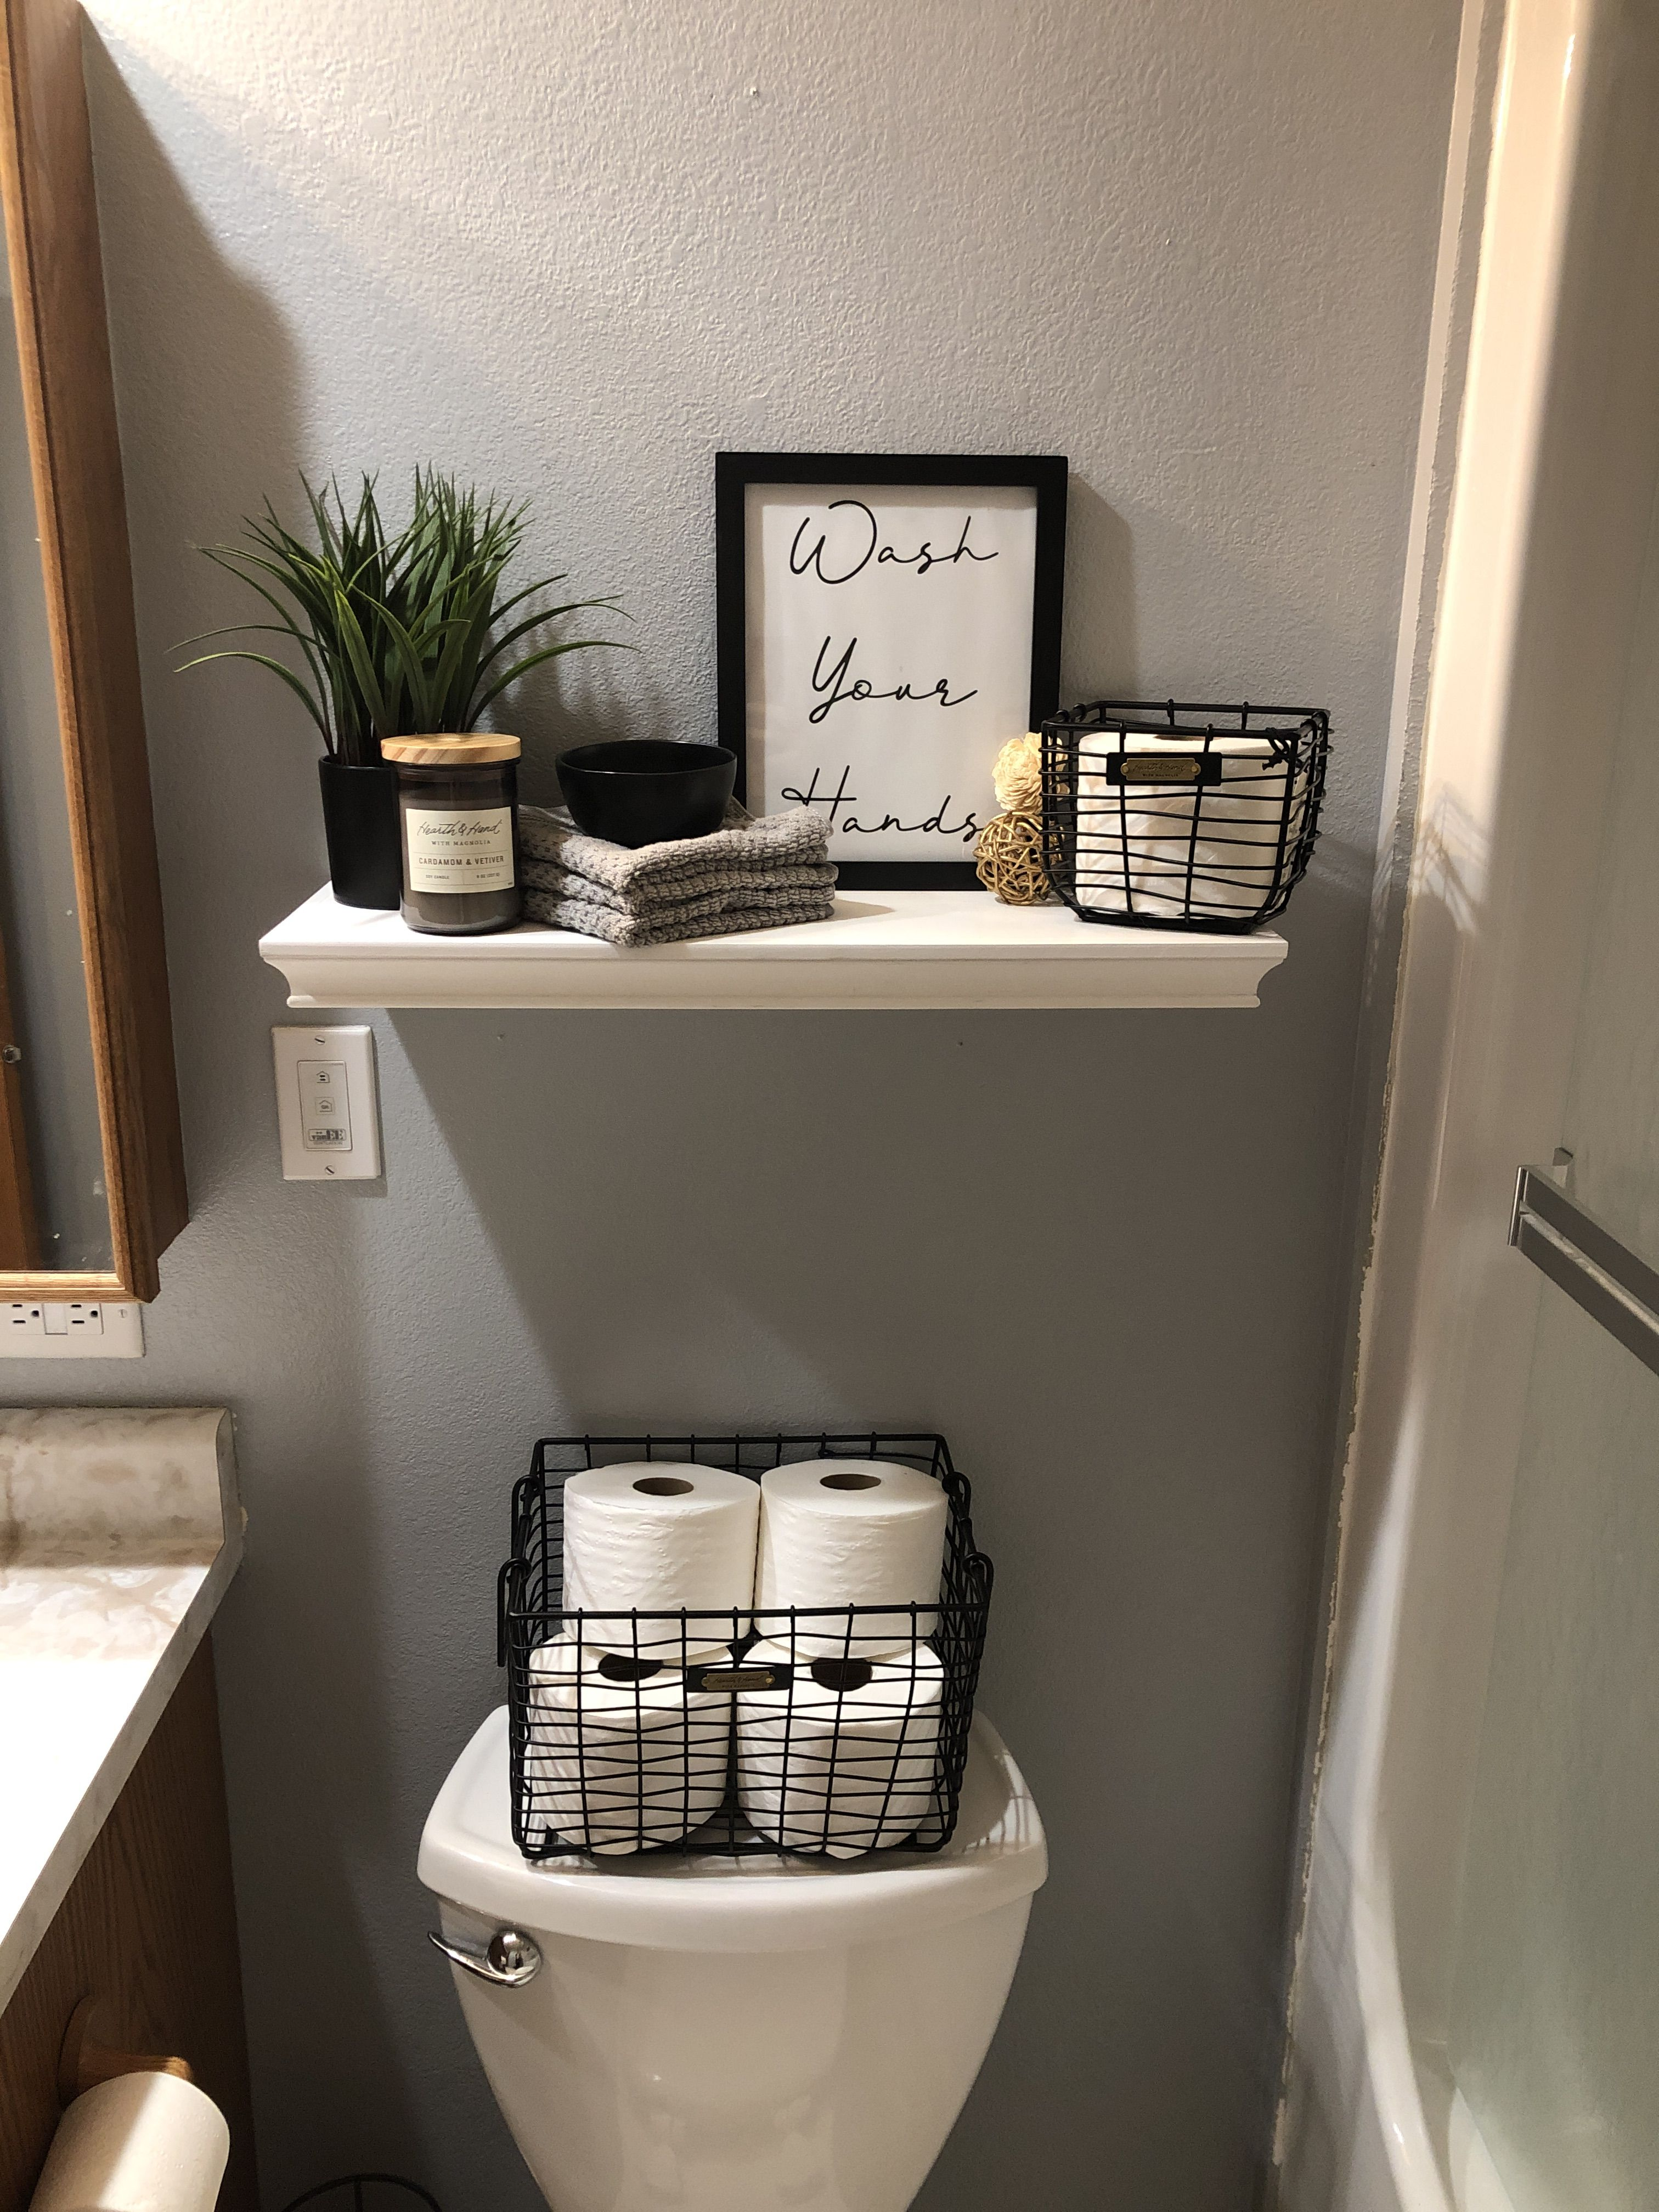 Wire Storage Basket Black Hearth Hand With Magnolia Gold Bathroom Decor Bathroom Decor Half Bathroom Decor Bathroom basket decorating ideas